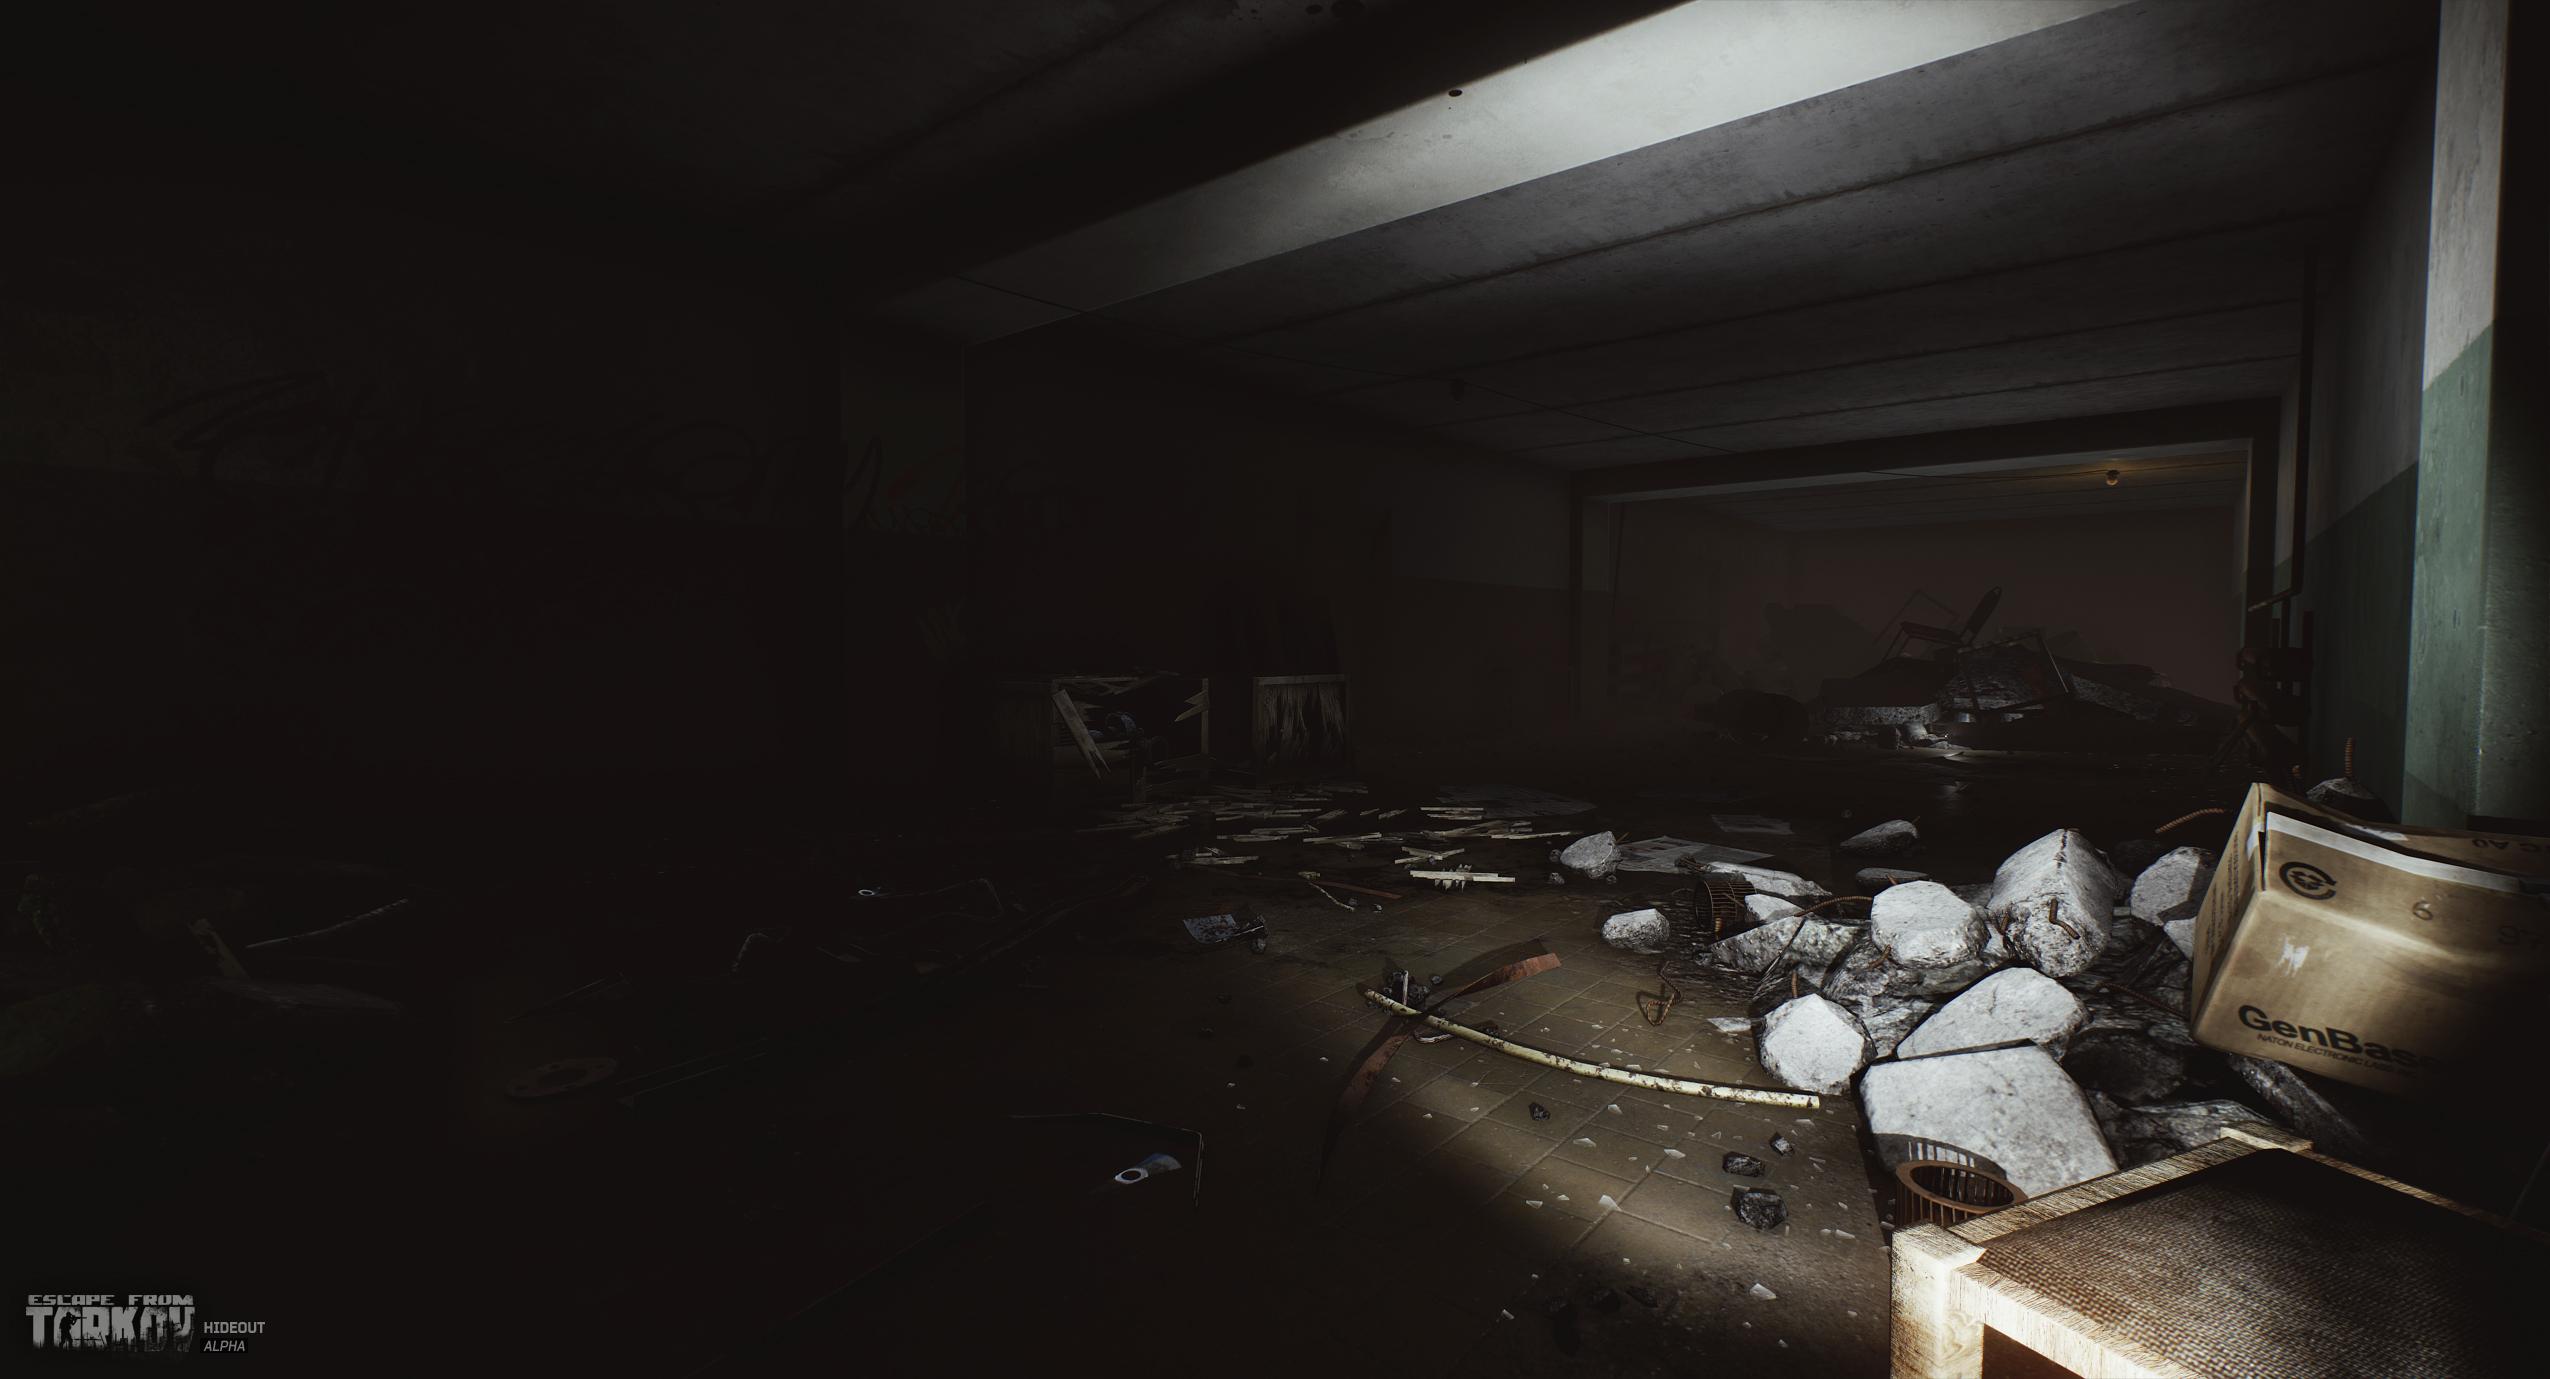 escapefromtarkov_hideout2.jpg